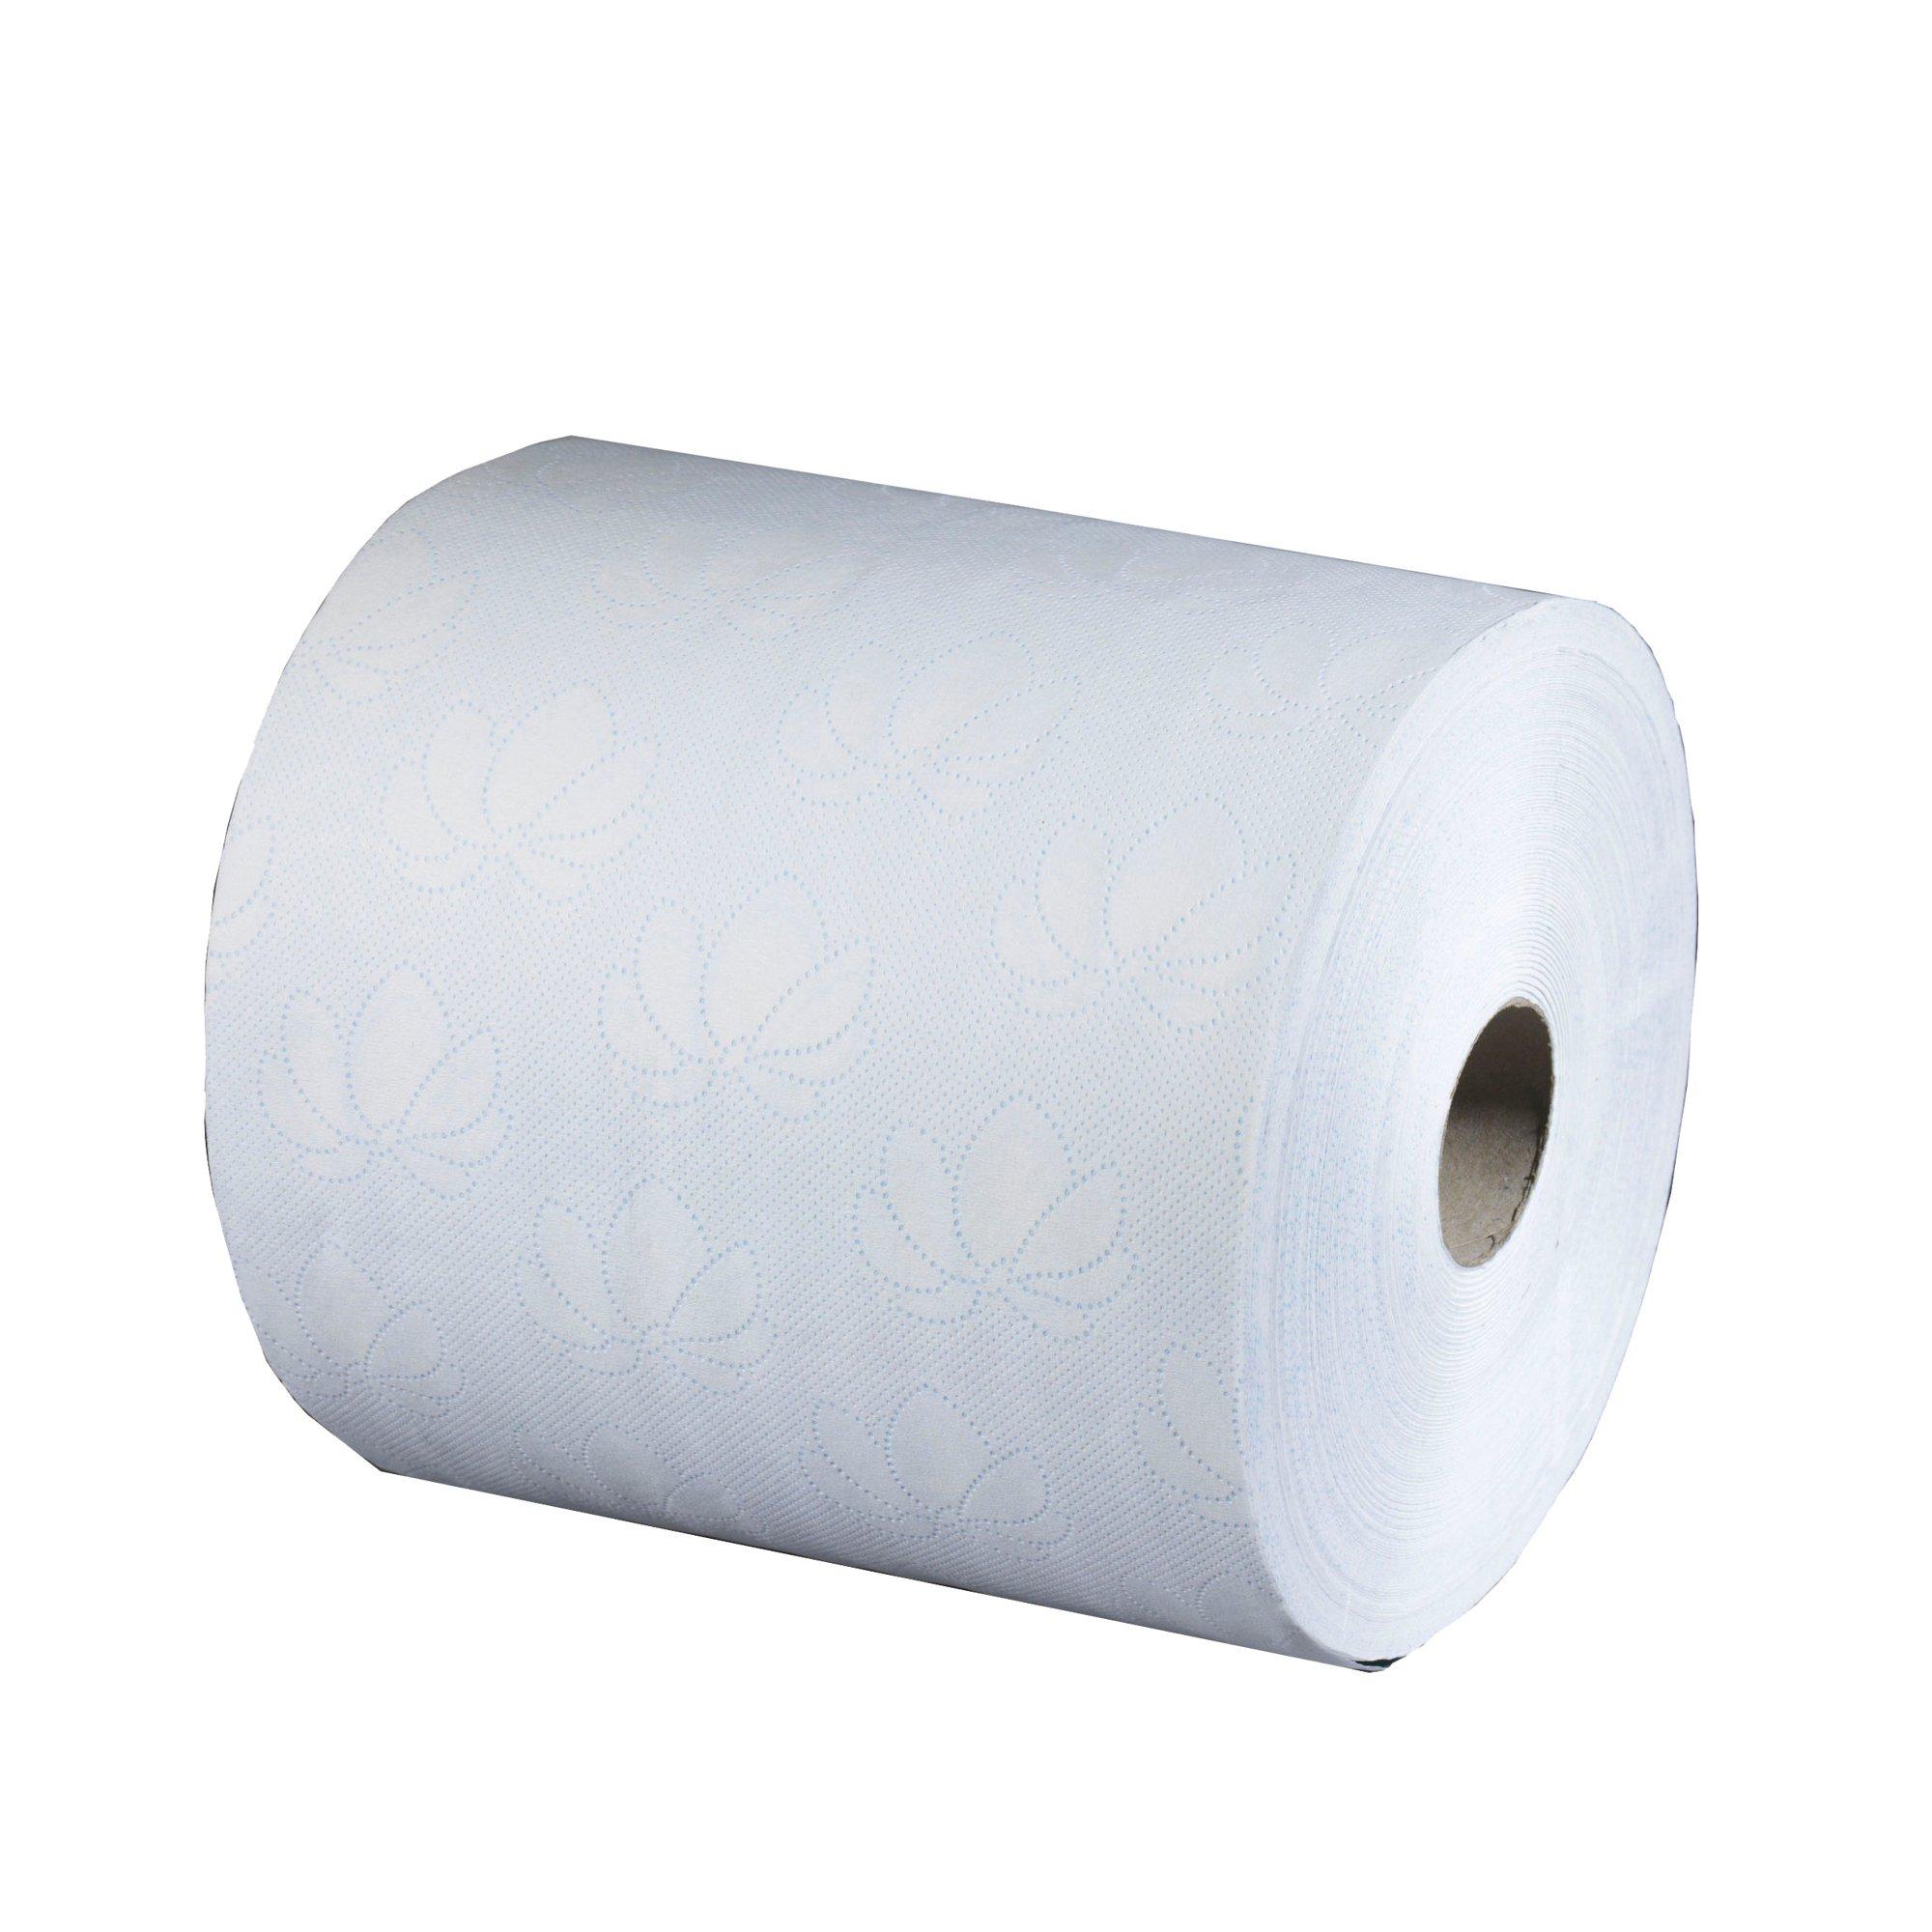 Tork SmartOne Mini Toilet Roll 2-ply 620 Sheets per Roll White Ref 472193 [12 Rolls per Pack]